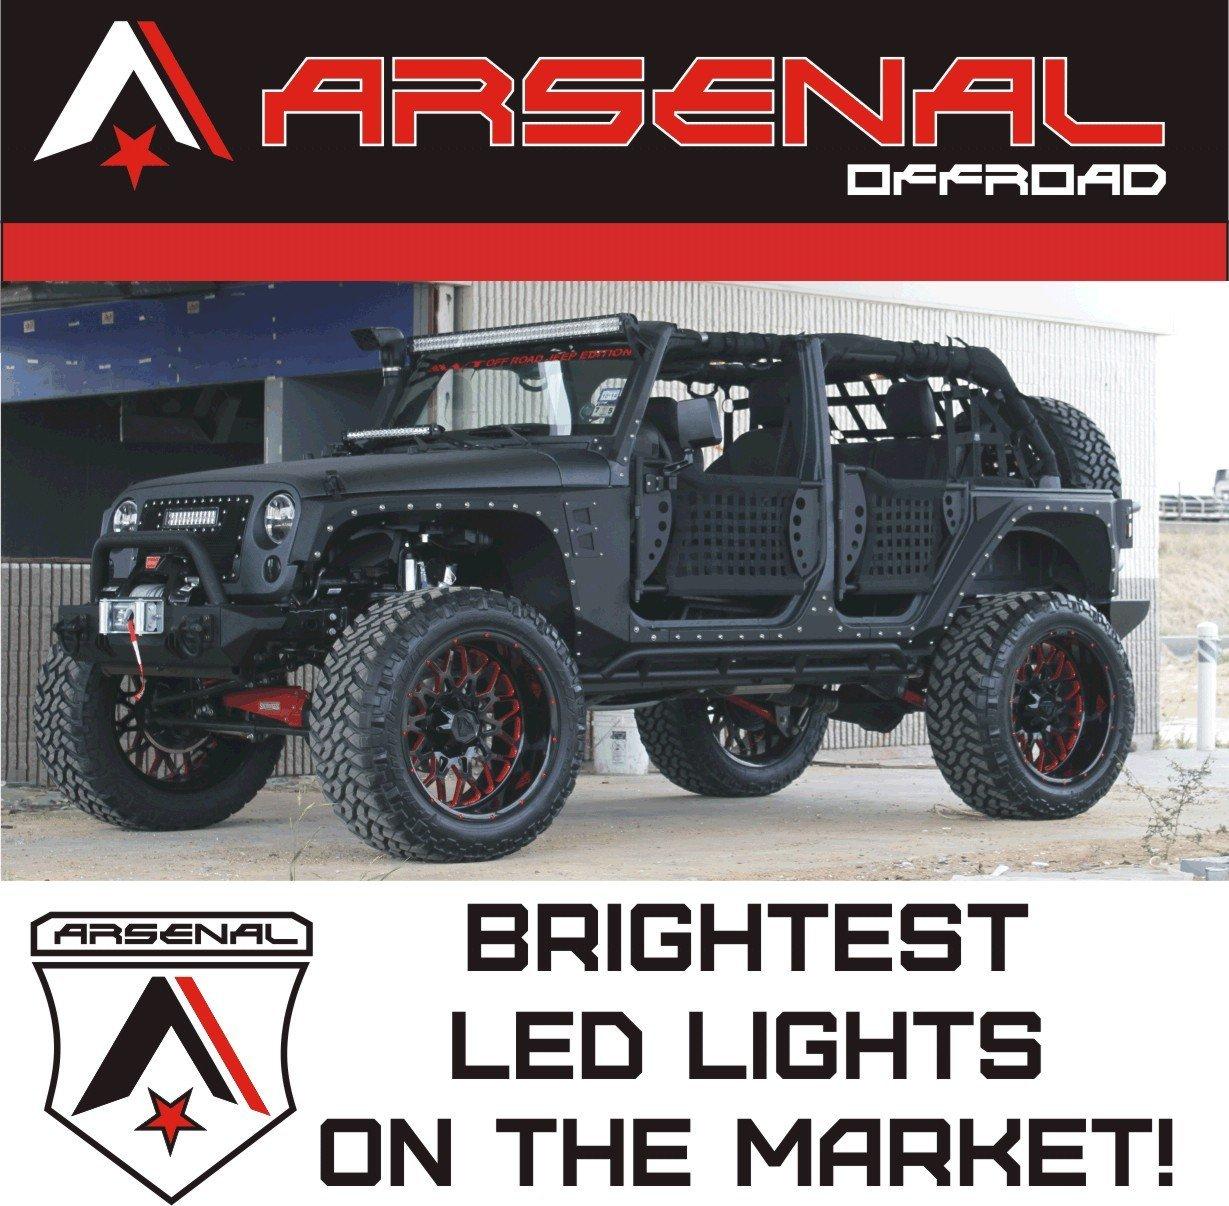 46 5d Halo Led Light Bar By Arsenal Offroad Drl Aliexpresscom Buy 43 Inch 288w Cree Work Wiring Kit Super Spot 10w Leds 240w 21600 Lumen Off Road Polaris Rzr Utv Trucks Raptor